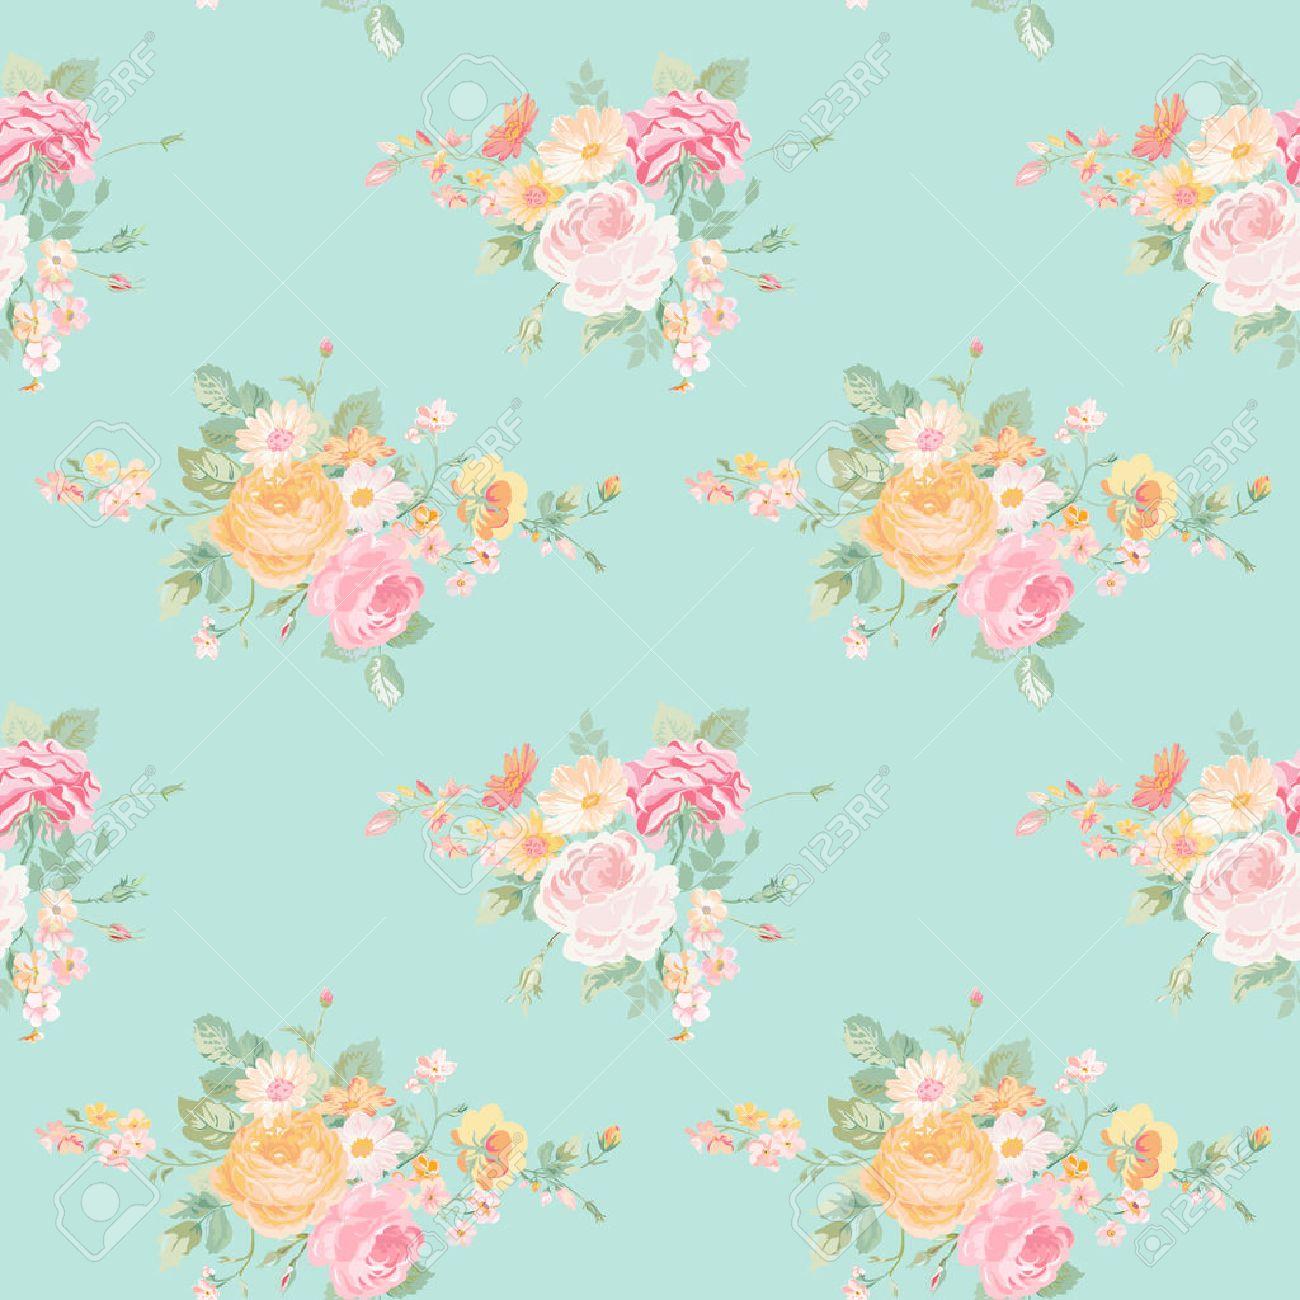 Antecedentes Flores Vintage Modelo Inconsutil Floral Elegante